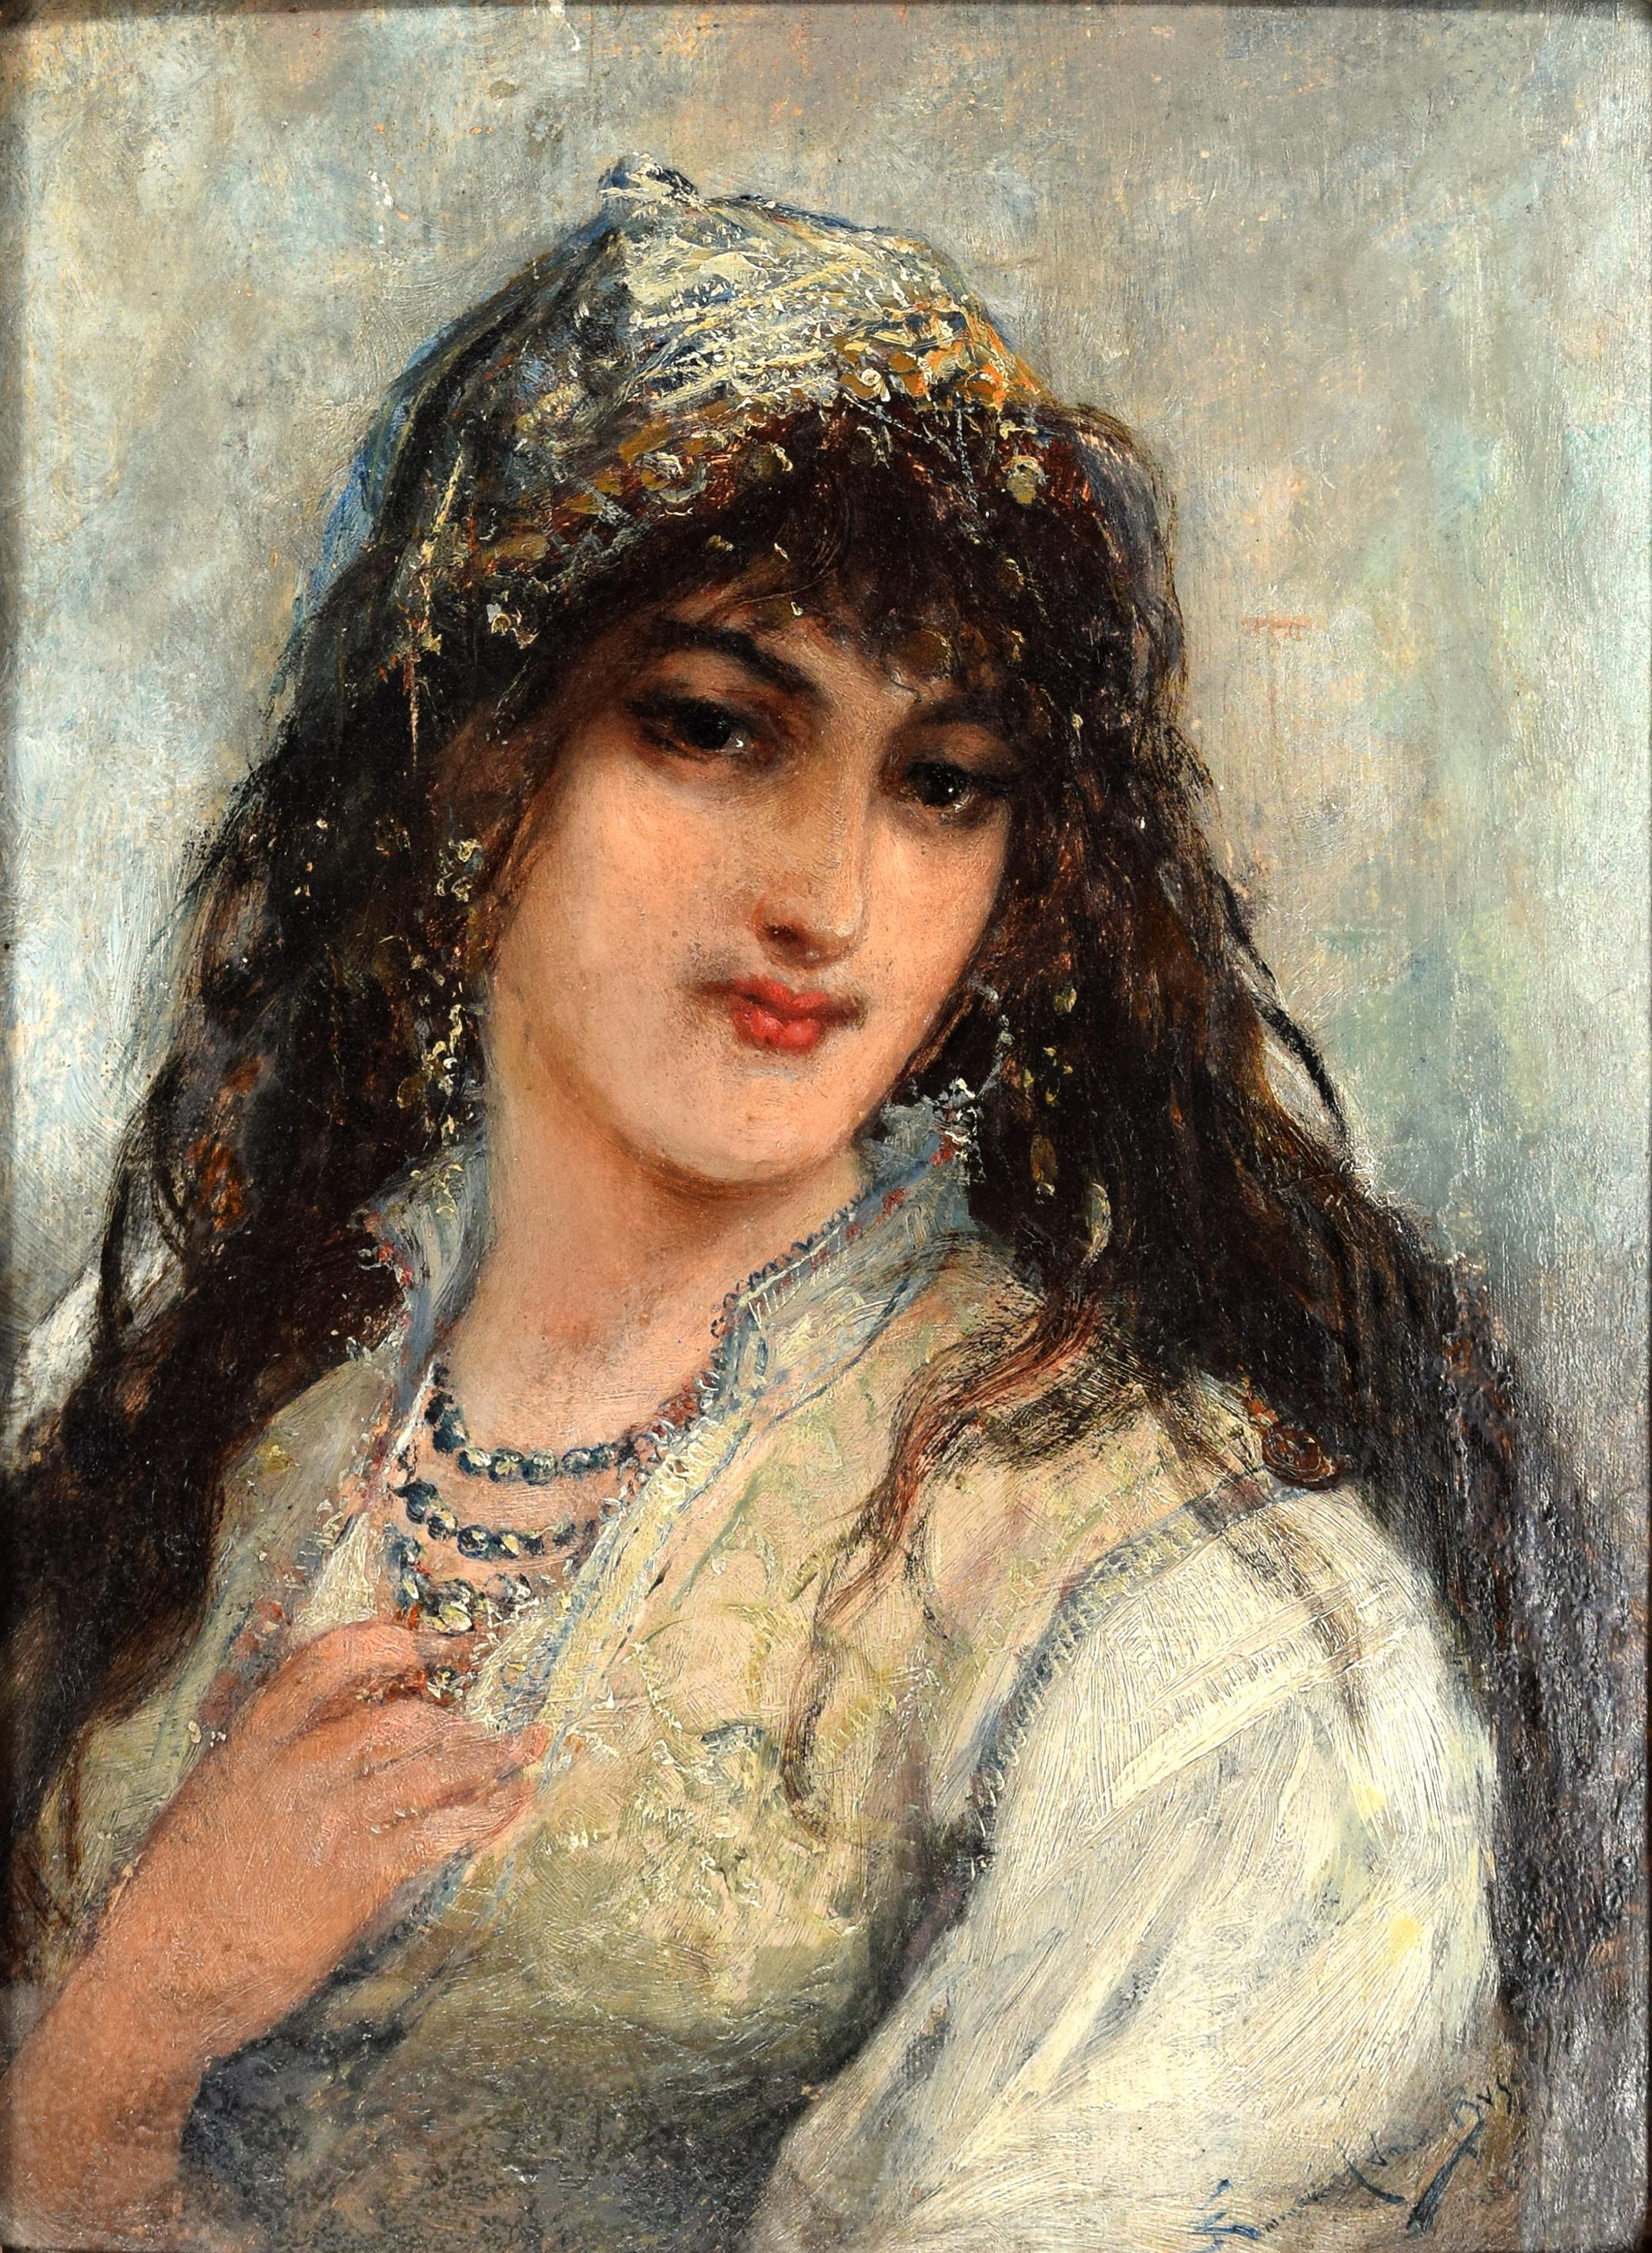 Portrait of Oriental Woman by Joseph Emmanuel Van den Bussche - 1885